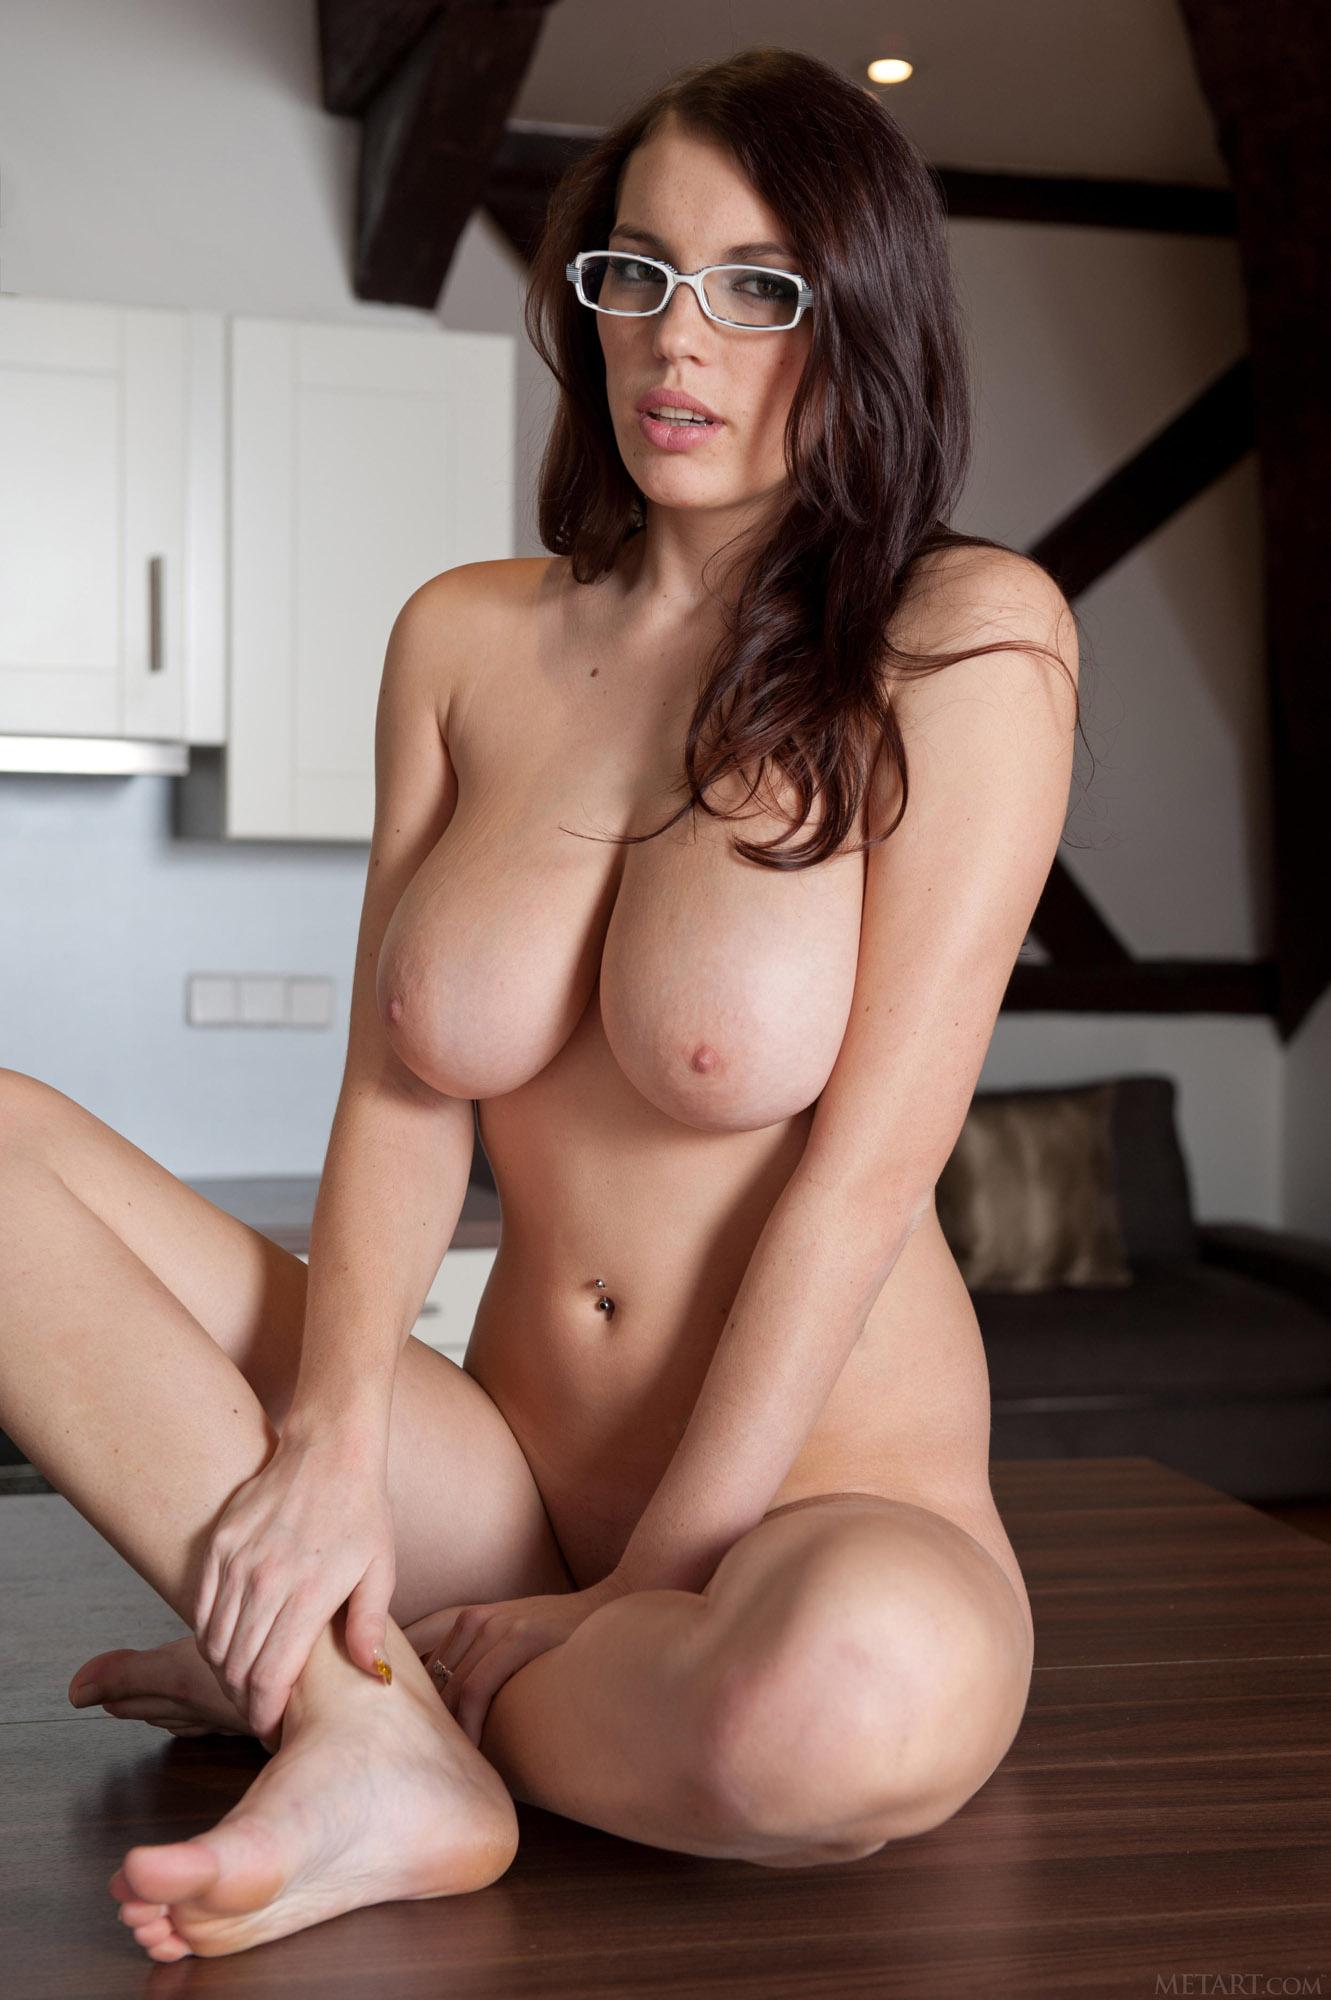 Busty Mixed Girl